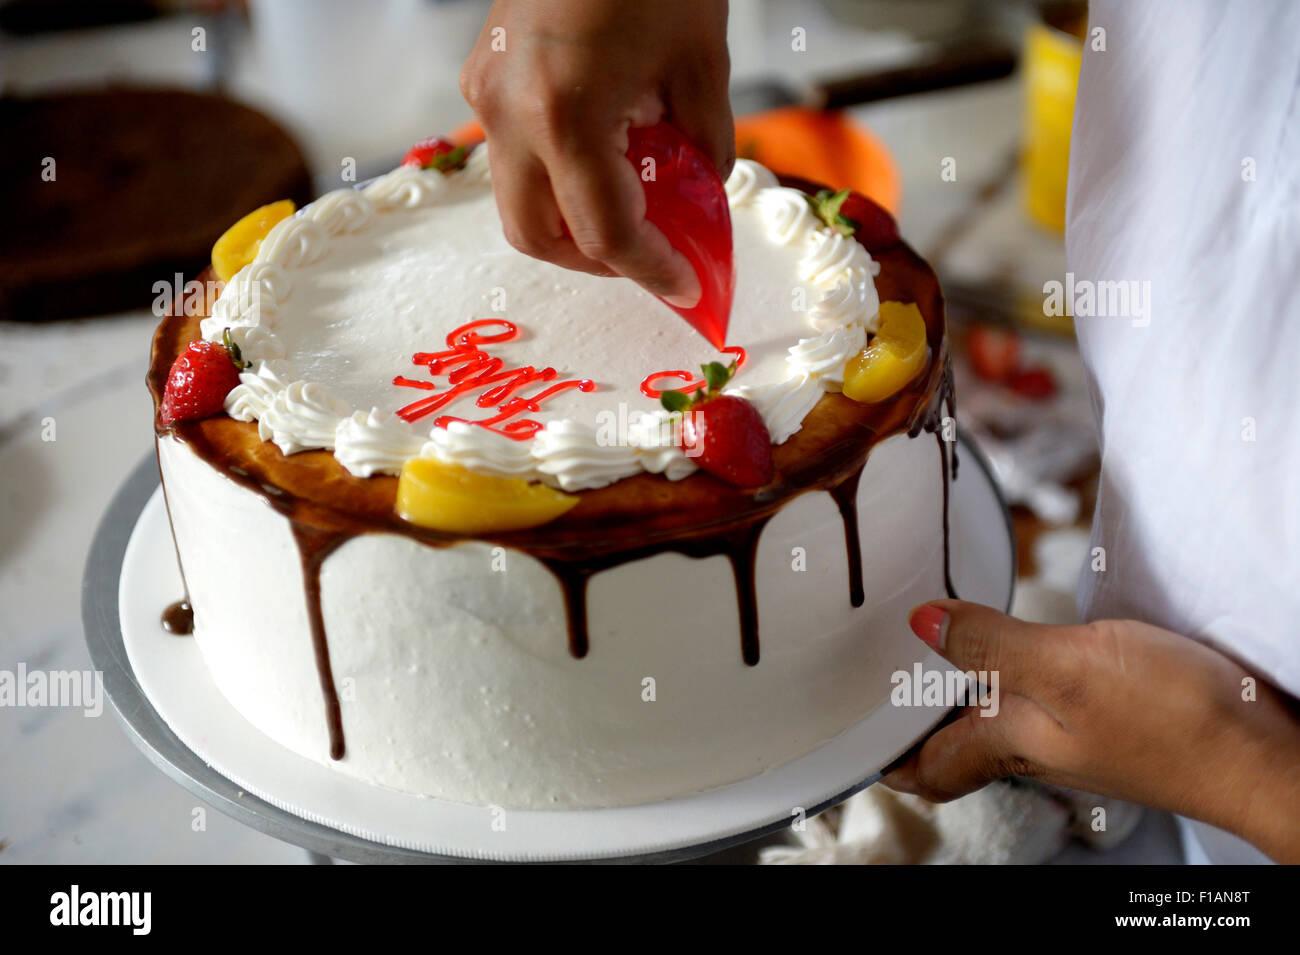 Geback Kochen Sahne Torte Verzieren Nahaufnahme Stockfoto Bild